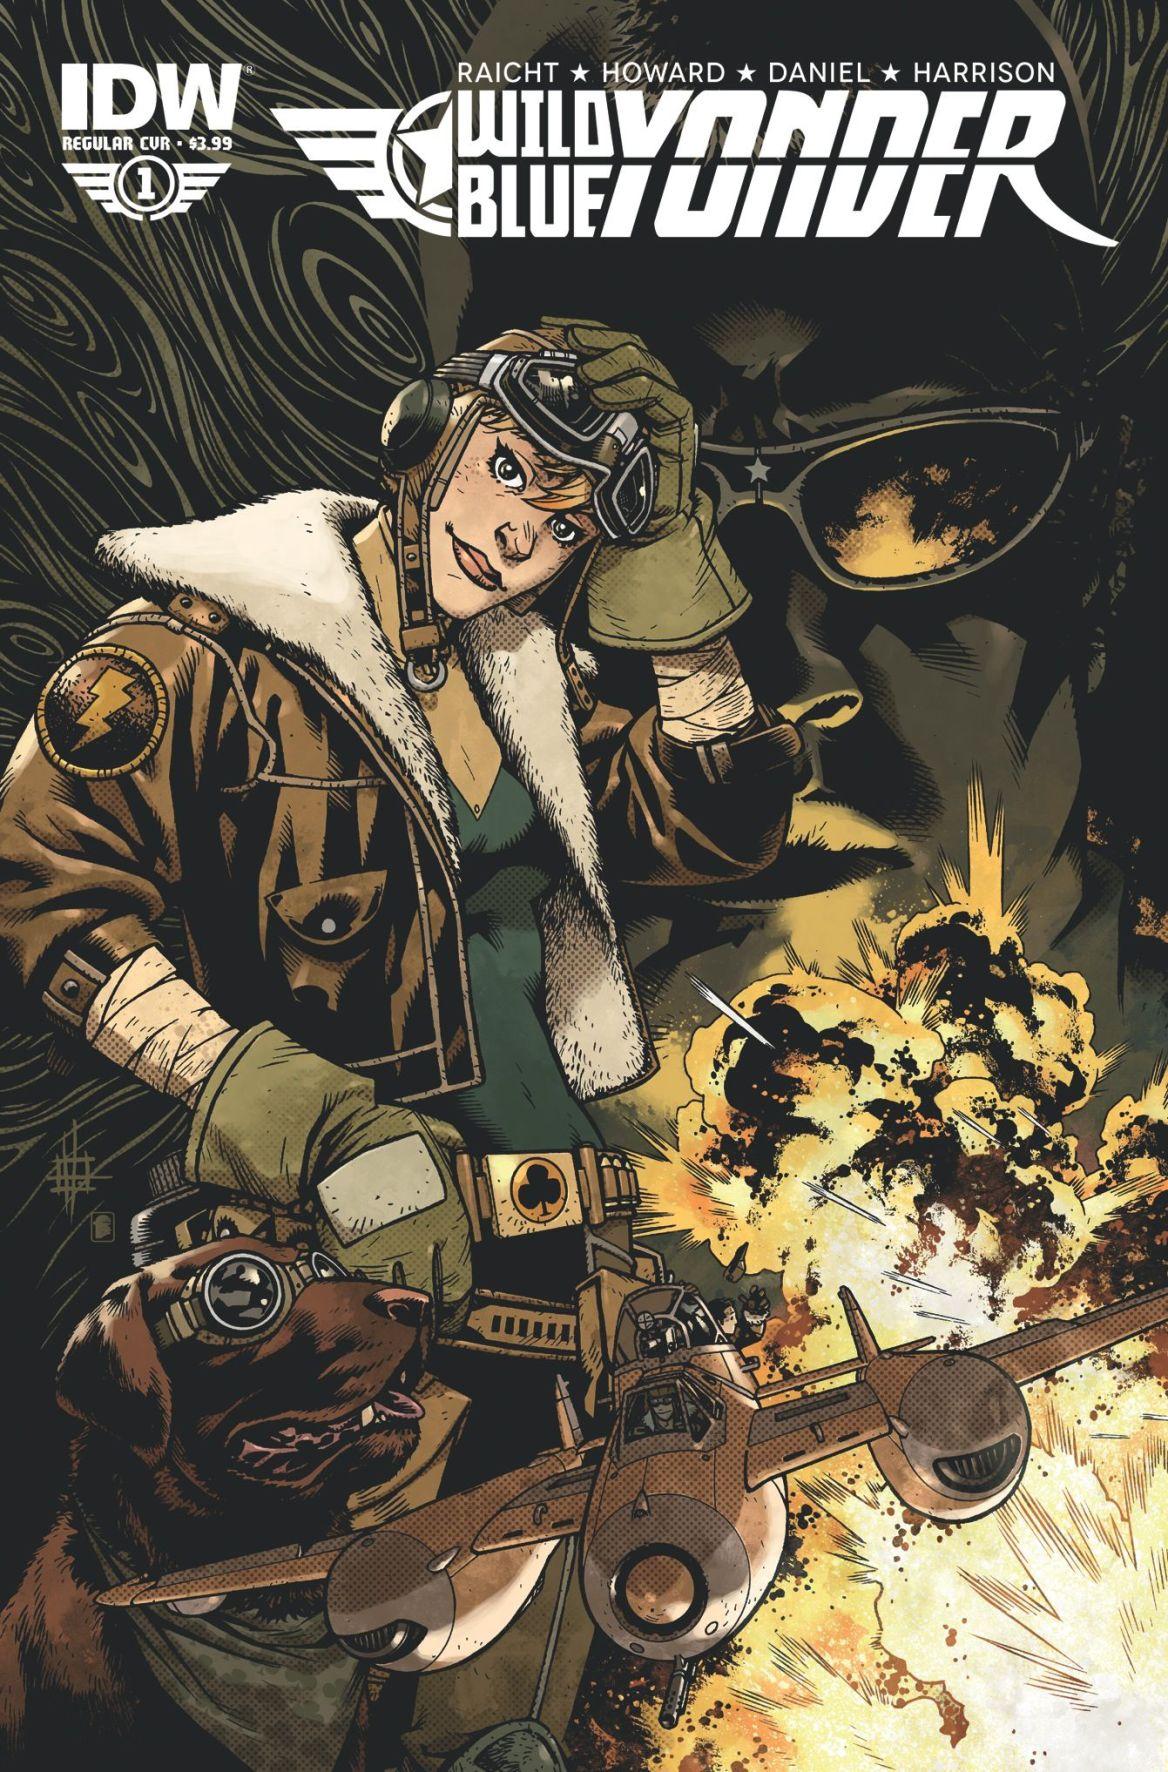 Comic book series has sky pirates, adventure